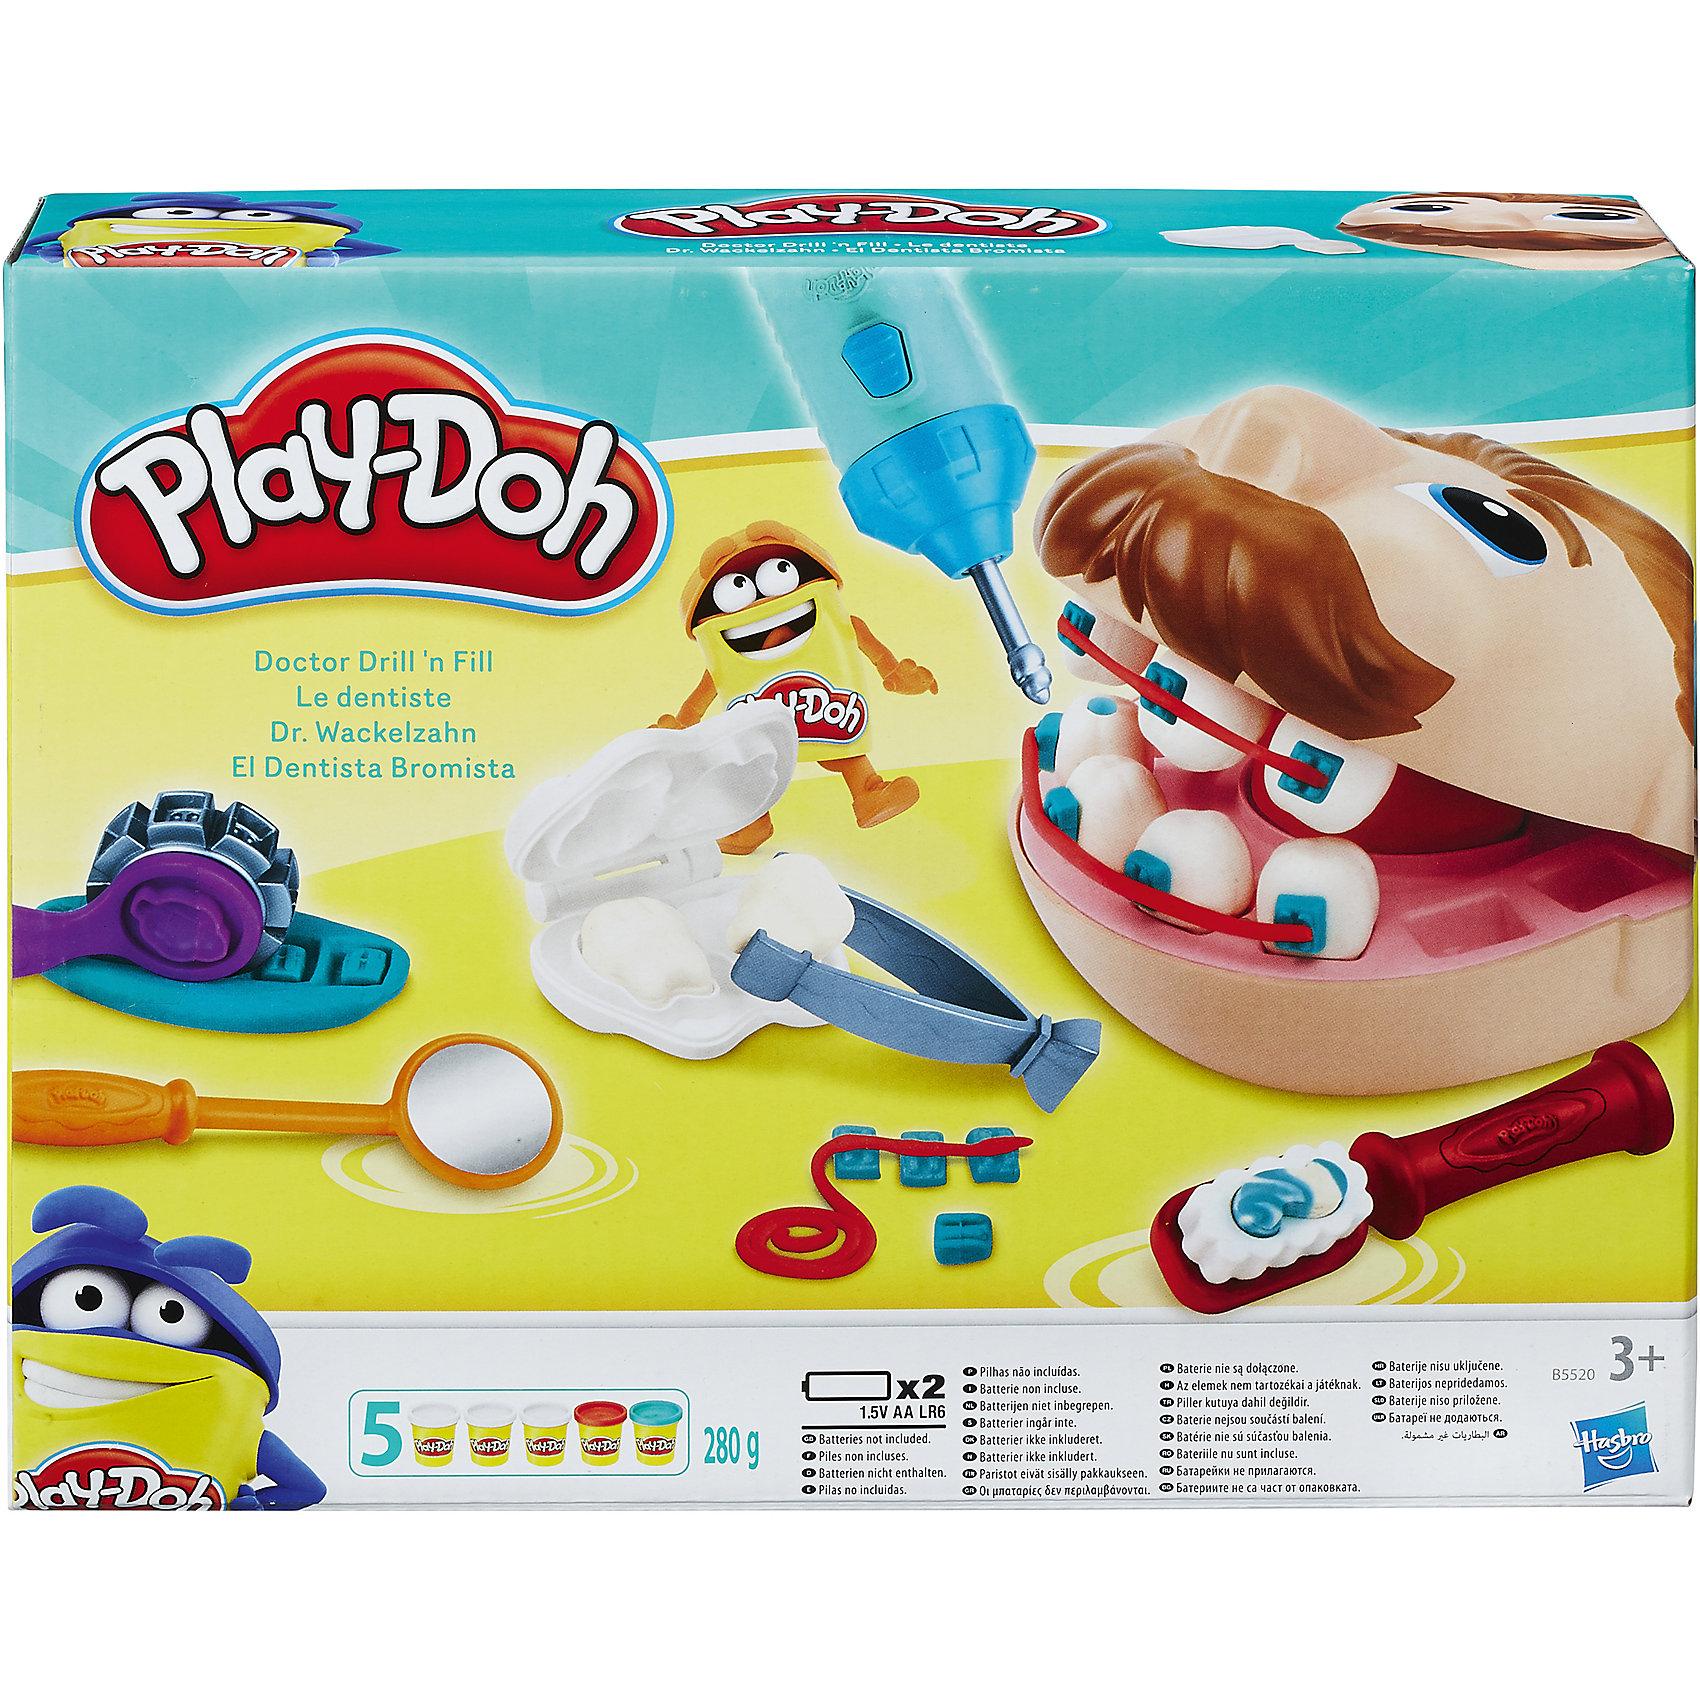 Hasbro Игровой набор Мистер Зубастик (Ретро версия), Play-Doh набор для лепки мистер зубастик play doh